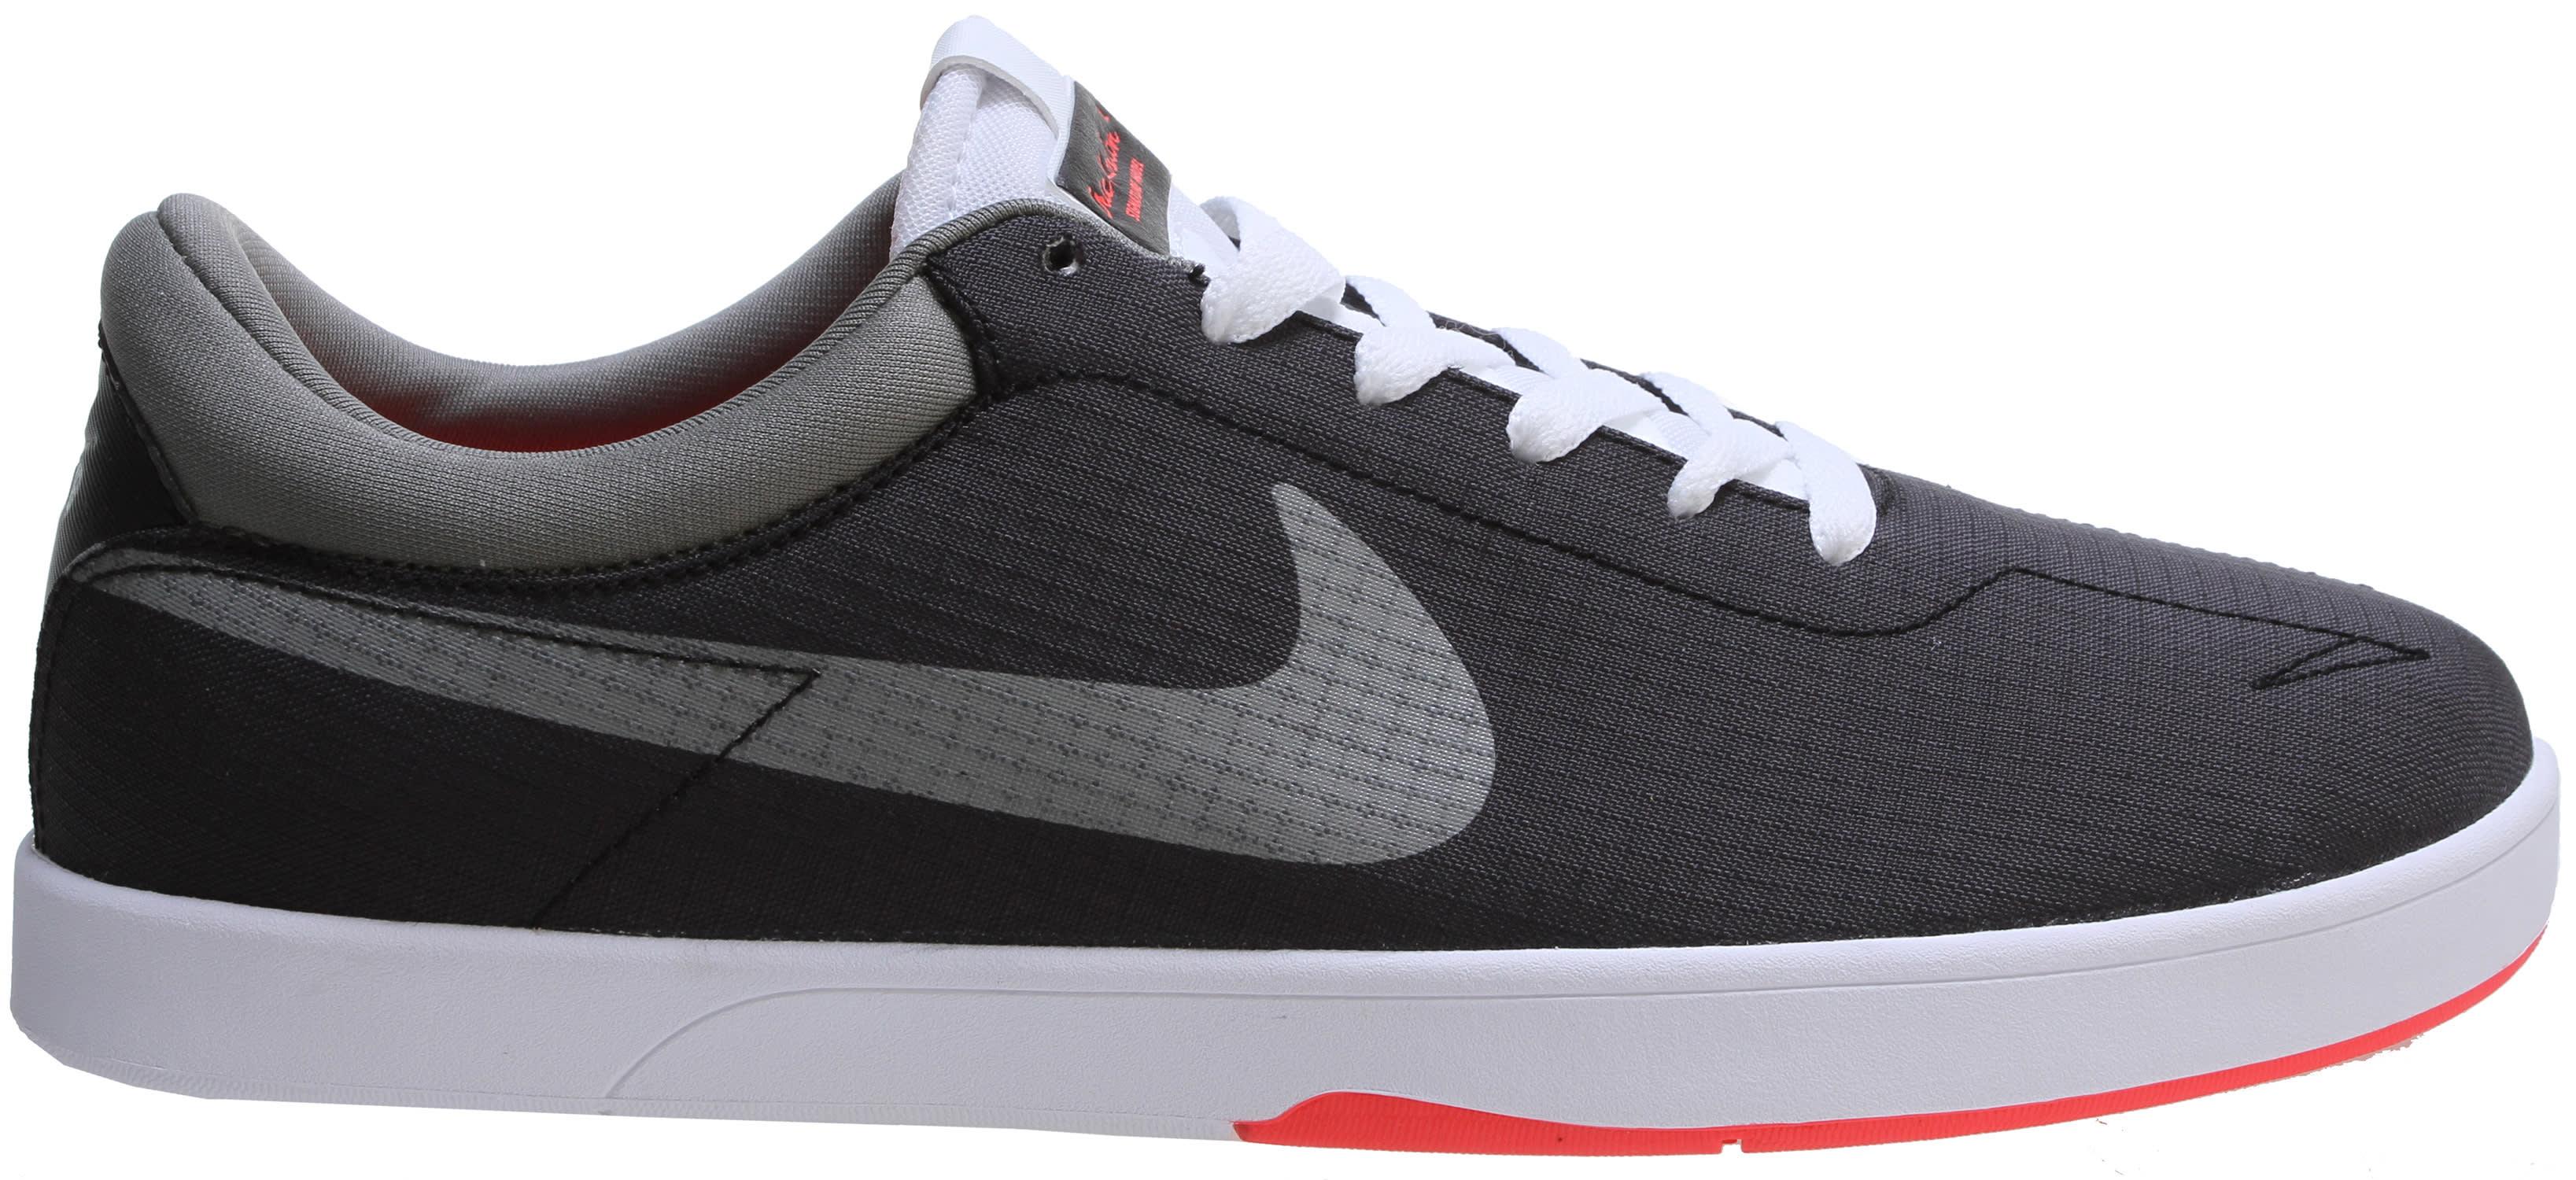 52a8870fd668 ... shoes blk mid base grey laser crimson 14 1 nike eric koston se